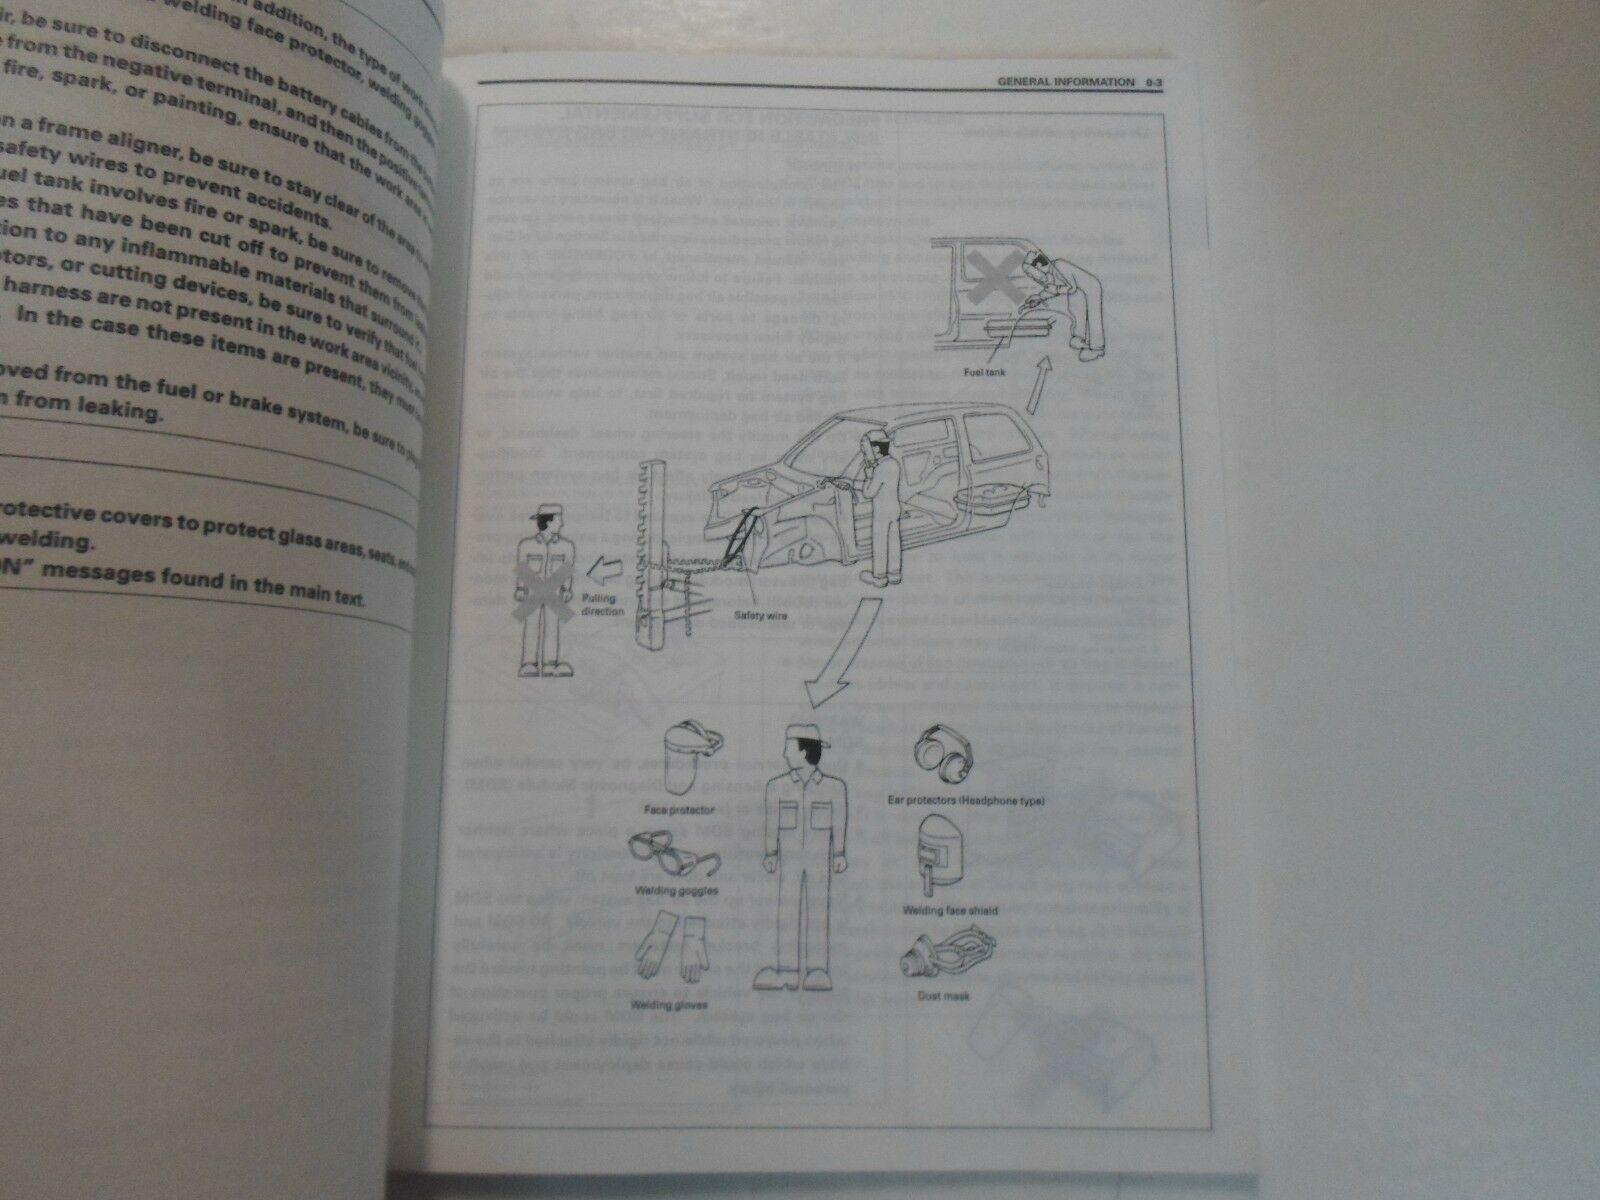 1997 Suzuki SY413 SV416 SV418 Körper Reparatur Manual Hatchback Sedan Fabrik OEM